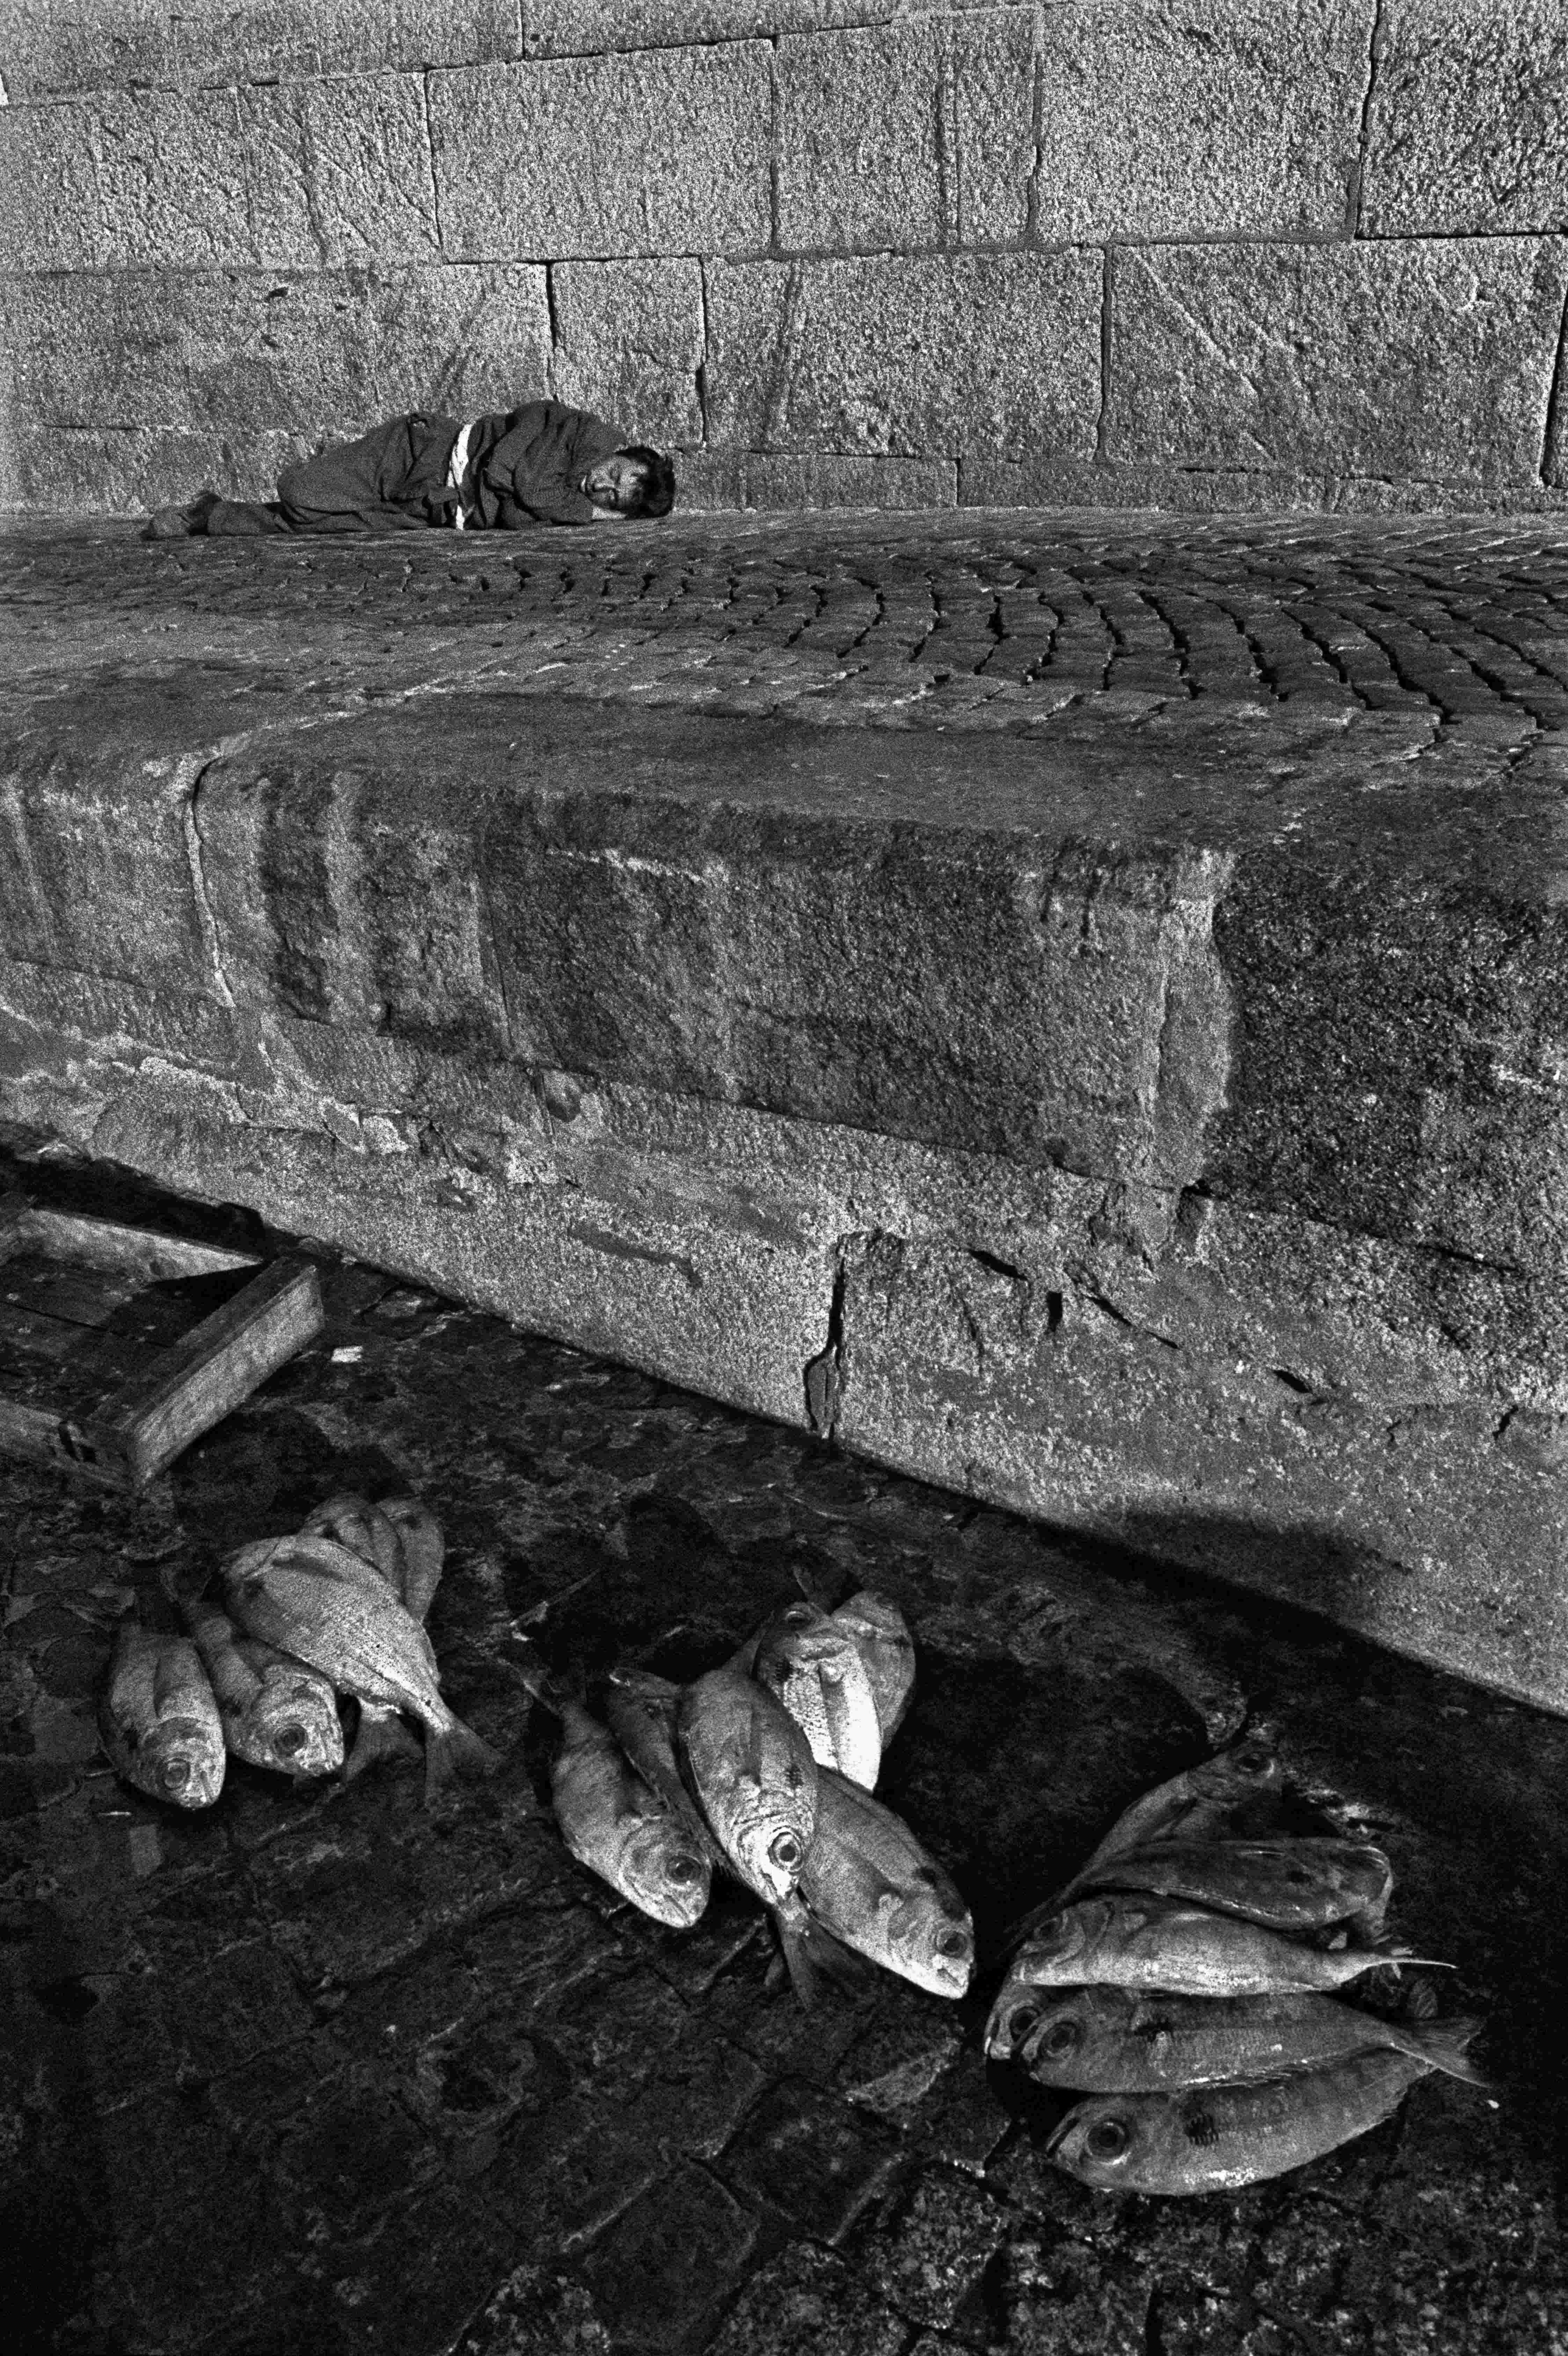 Un pescatore che dorme, Vigo, 1969 © Ferdinando Scianna/Magnum Photos/Contrasto